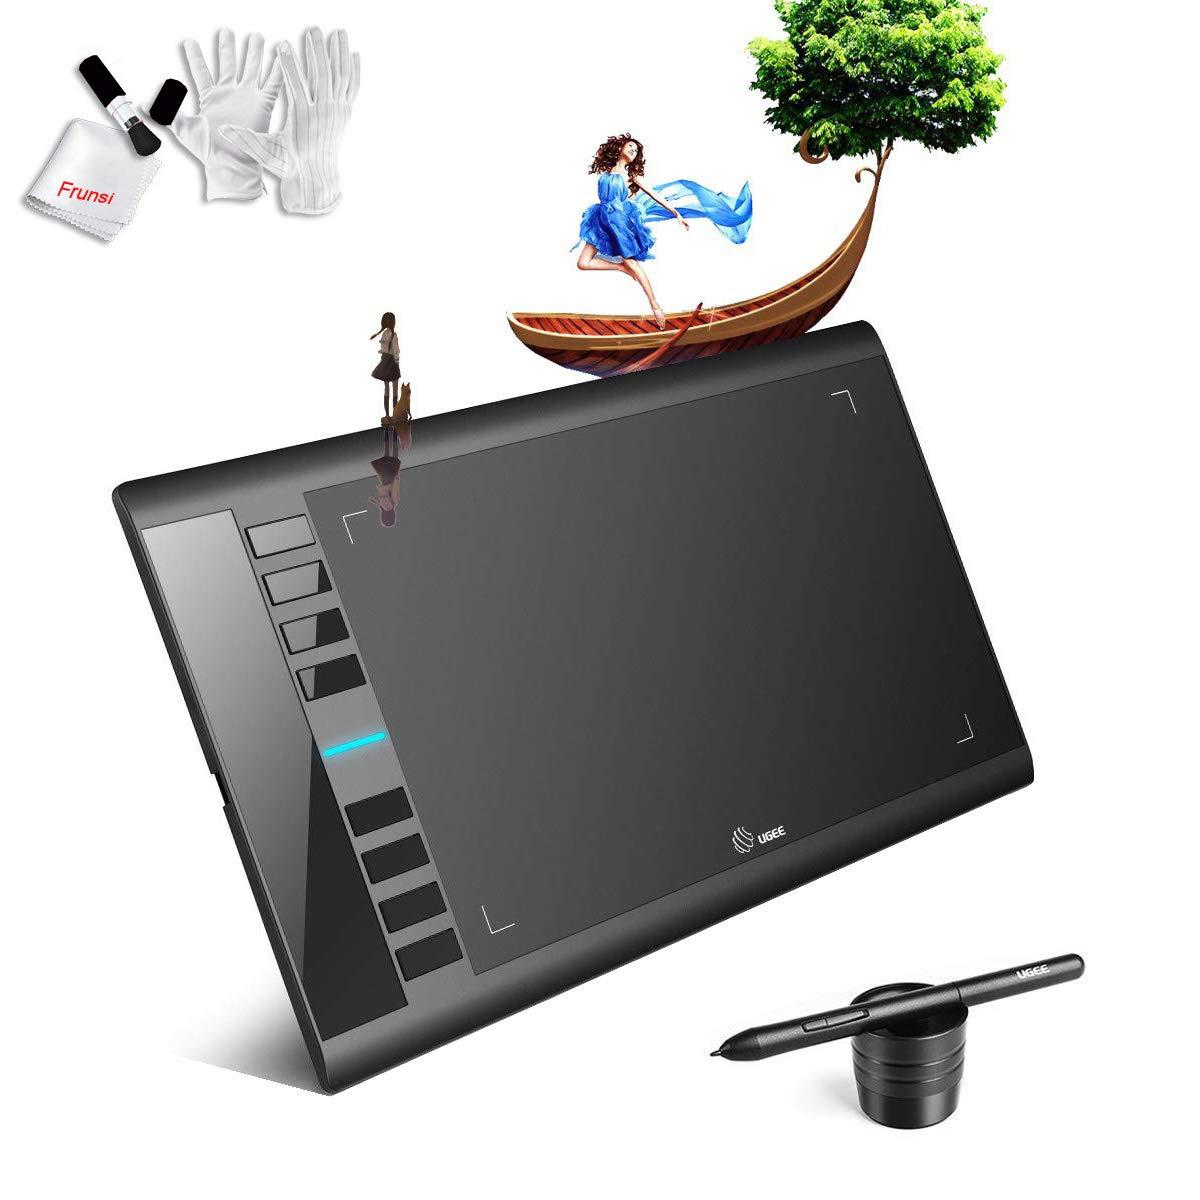 Tableta Digitalizadora FRUNSI M708 25.4x15.2cm 8192 NP